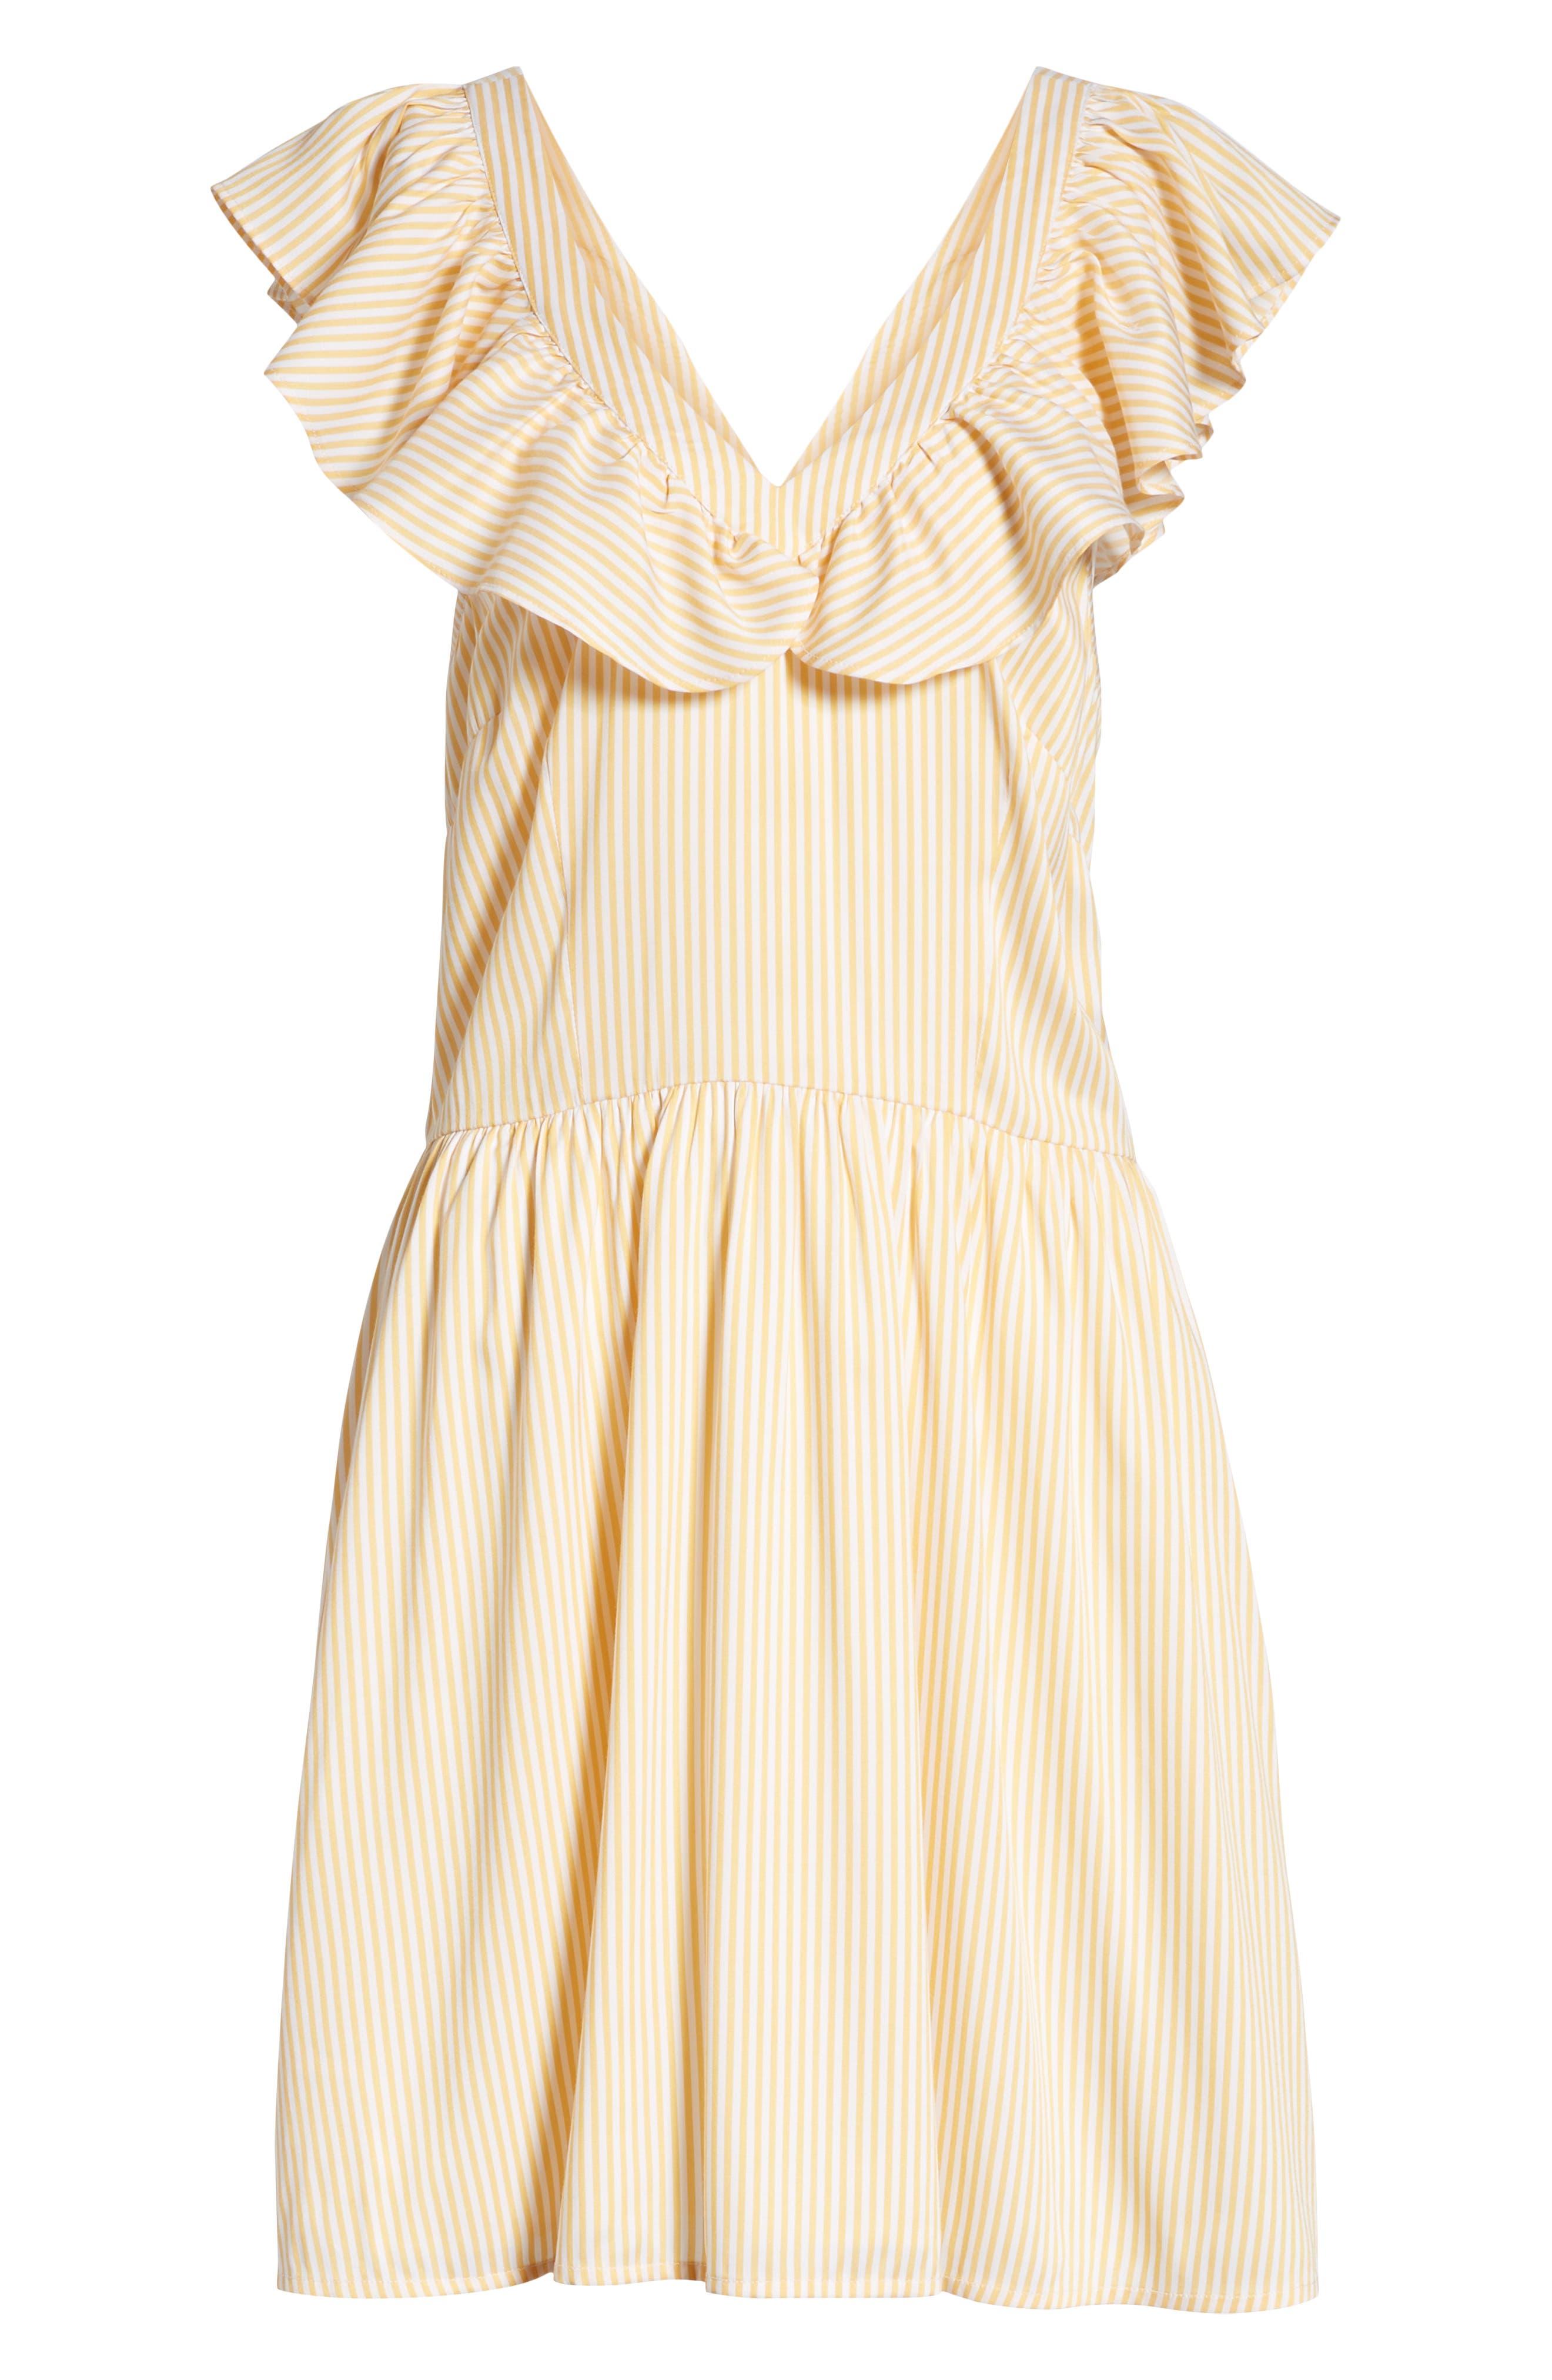 Ruffle Dress,                             Alternate thumbnail 7, color,                             Yellow Gleam Stratus Stripe